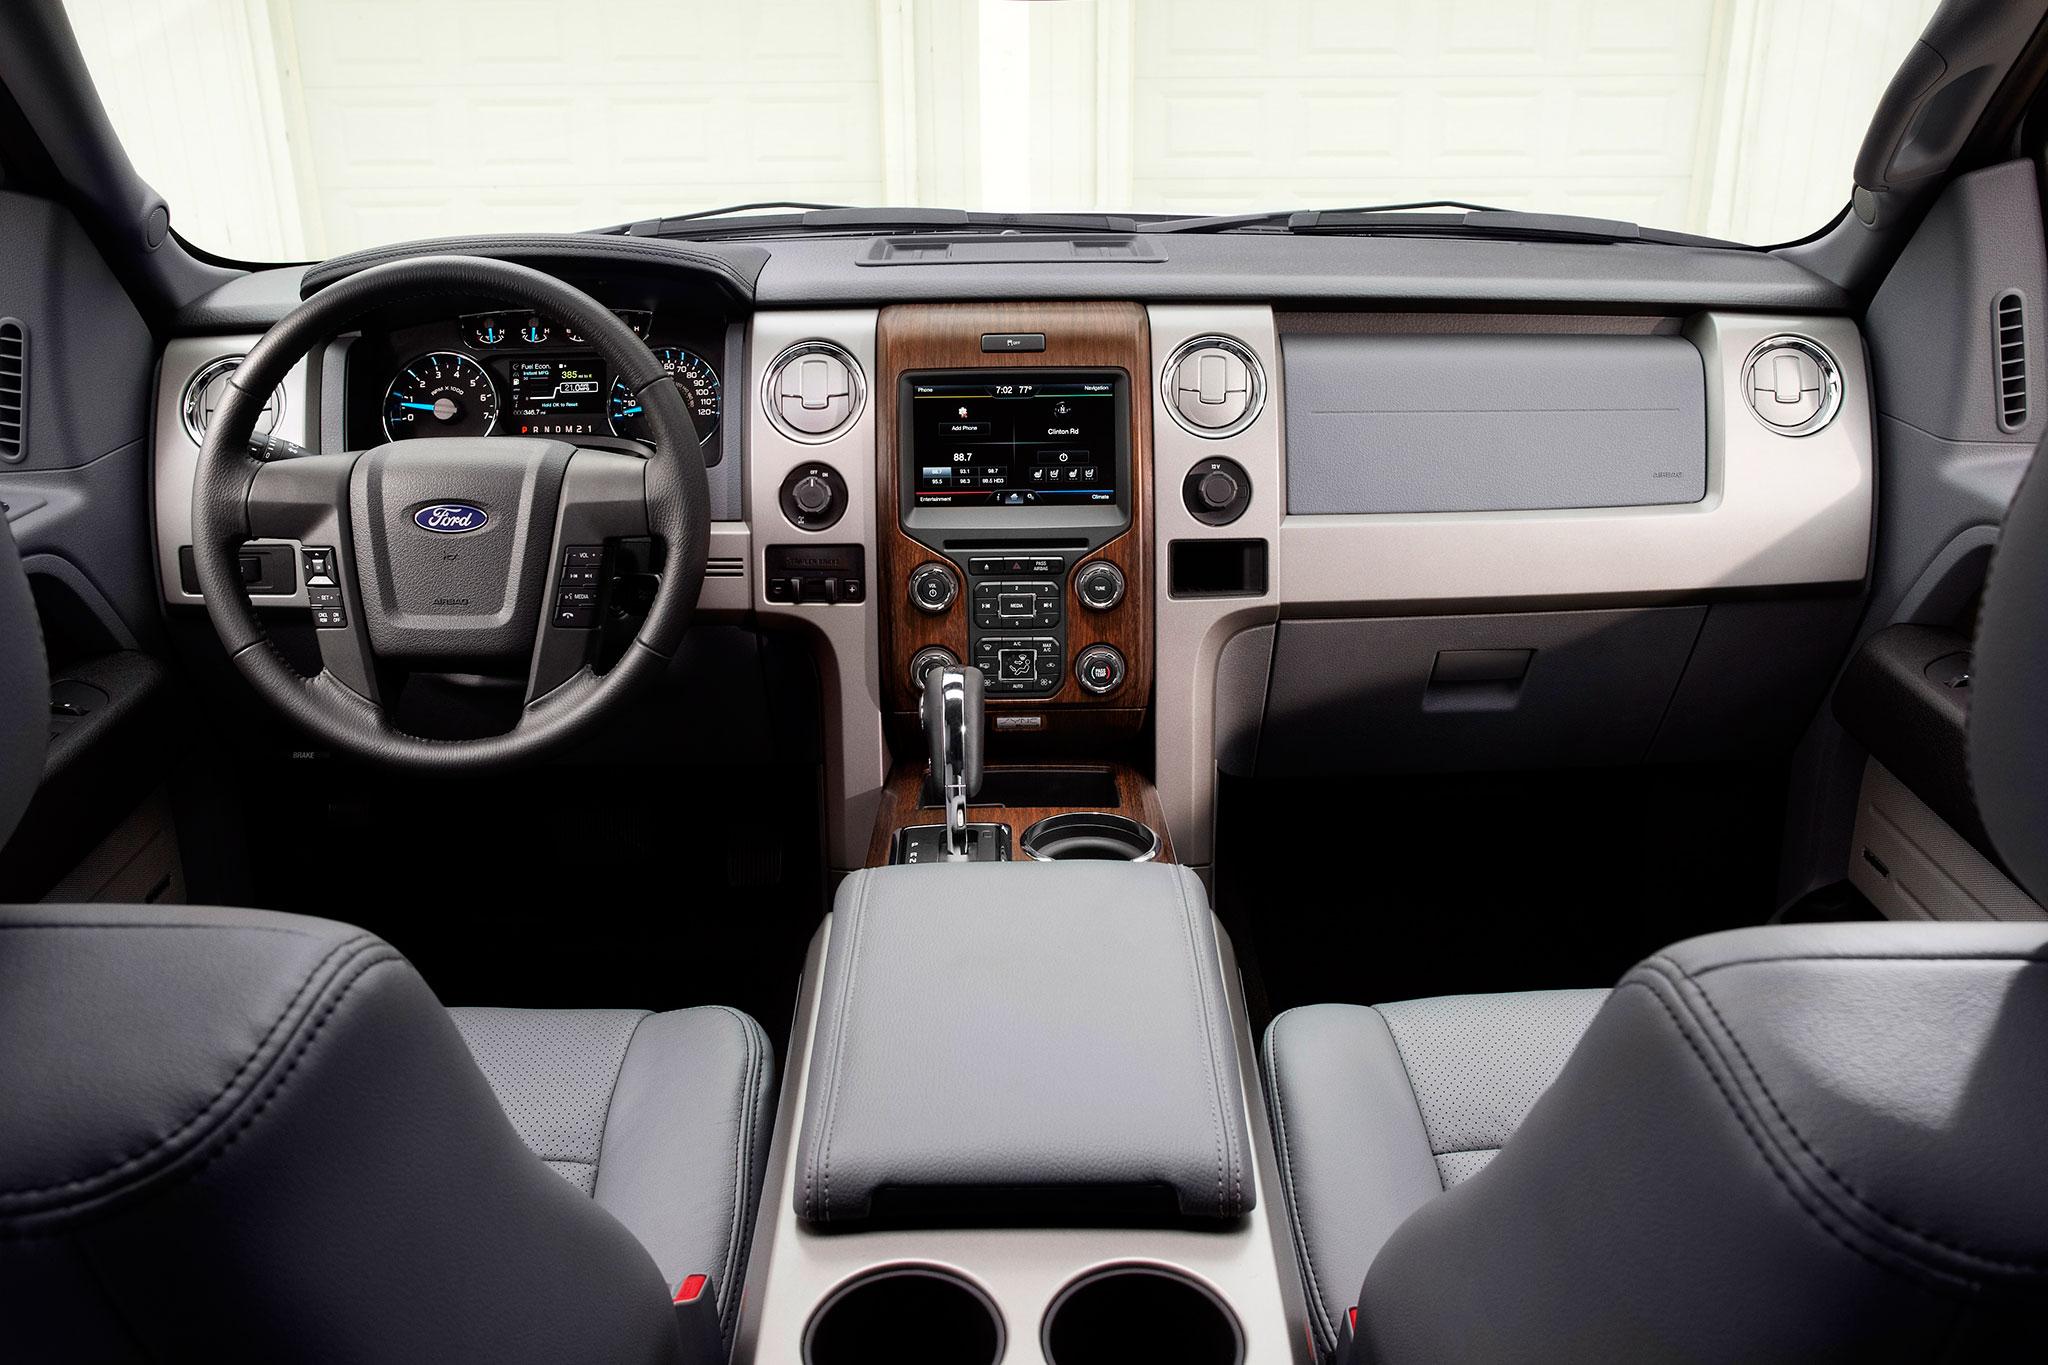 2014 Ford F 150 Lariat Dash